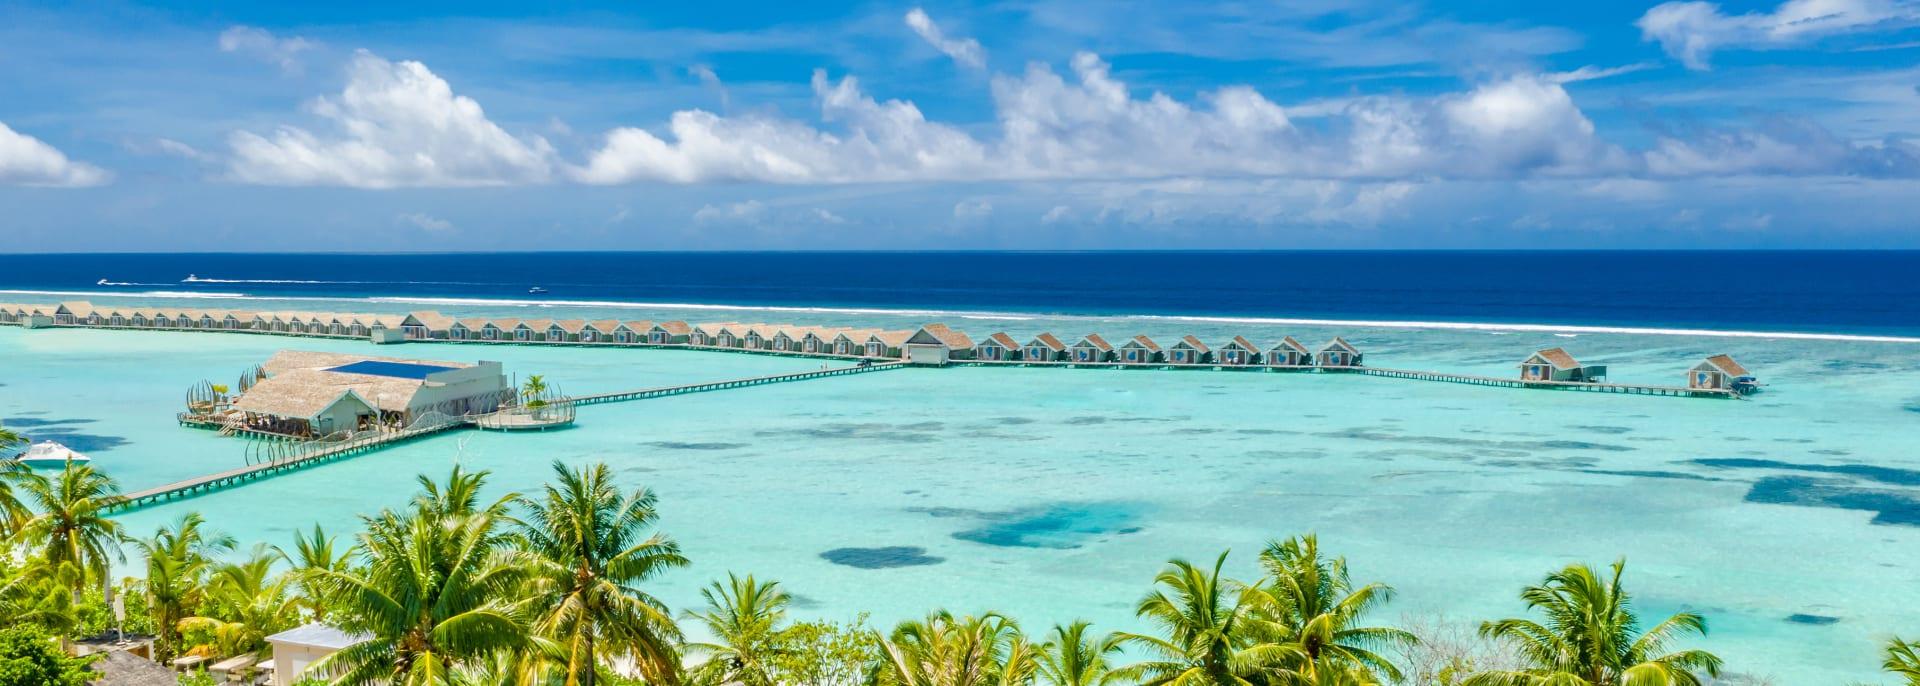 Ayada Maldives Resor, Malediven